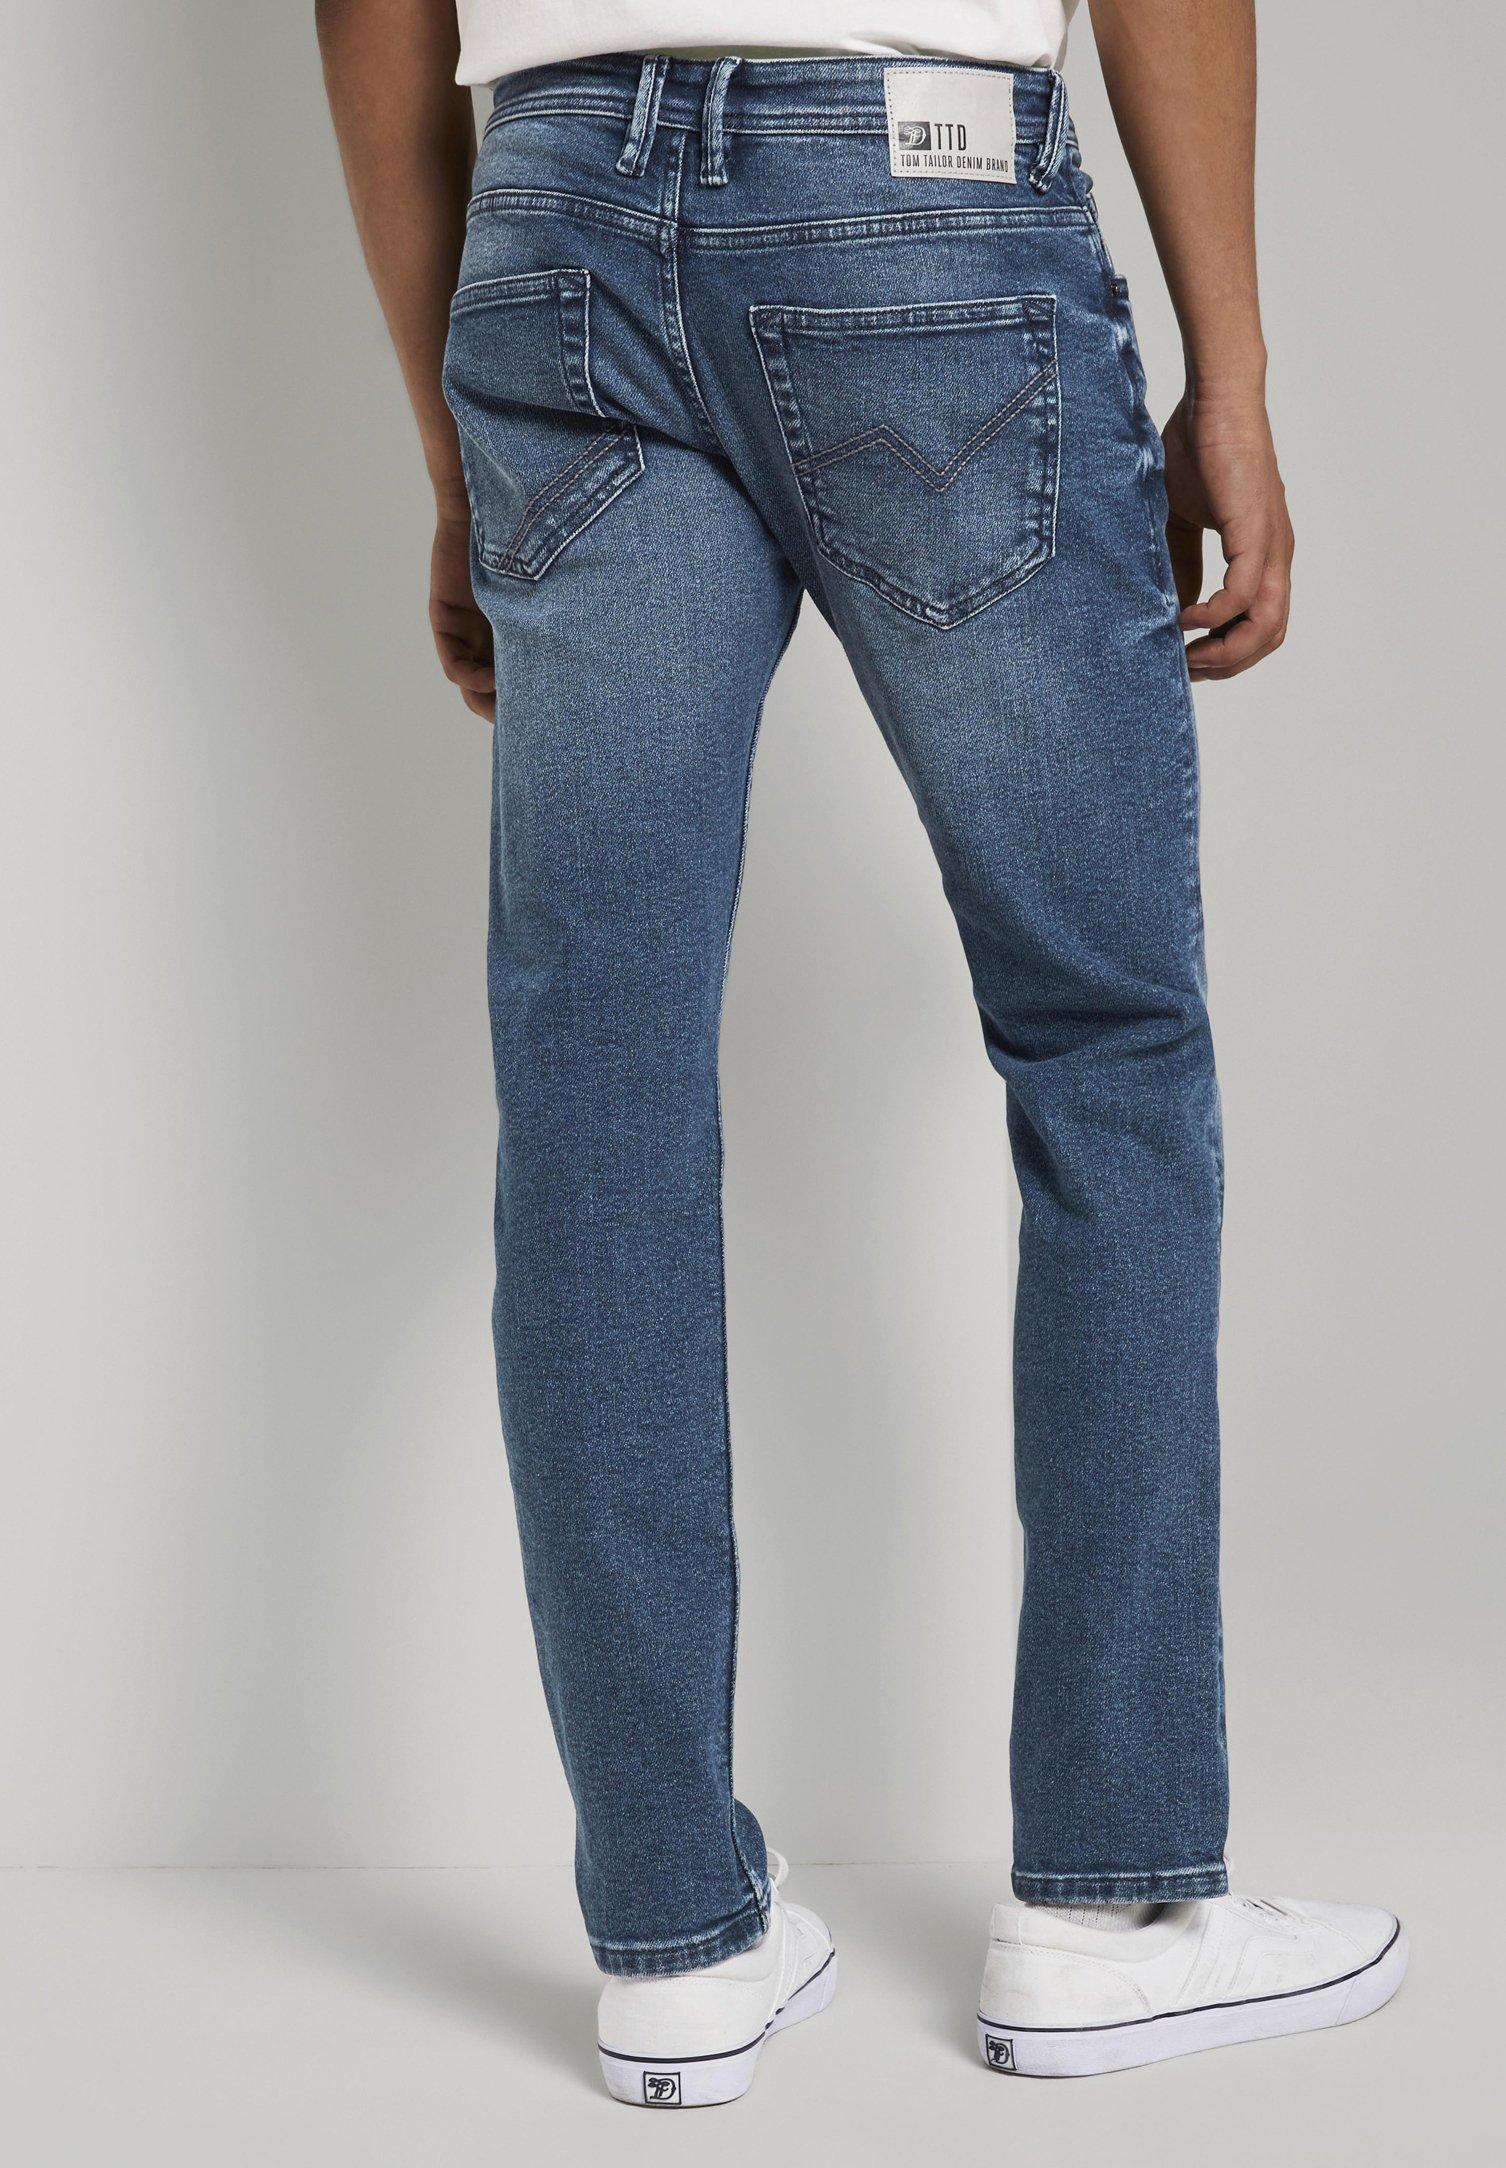 Tom Tailor Denim Piers - Jeans Slim Fit Used Light Stone Blue